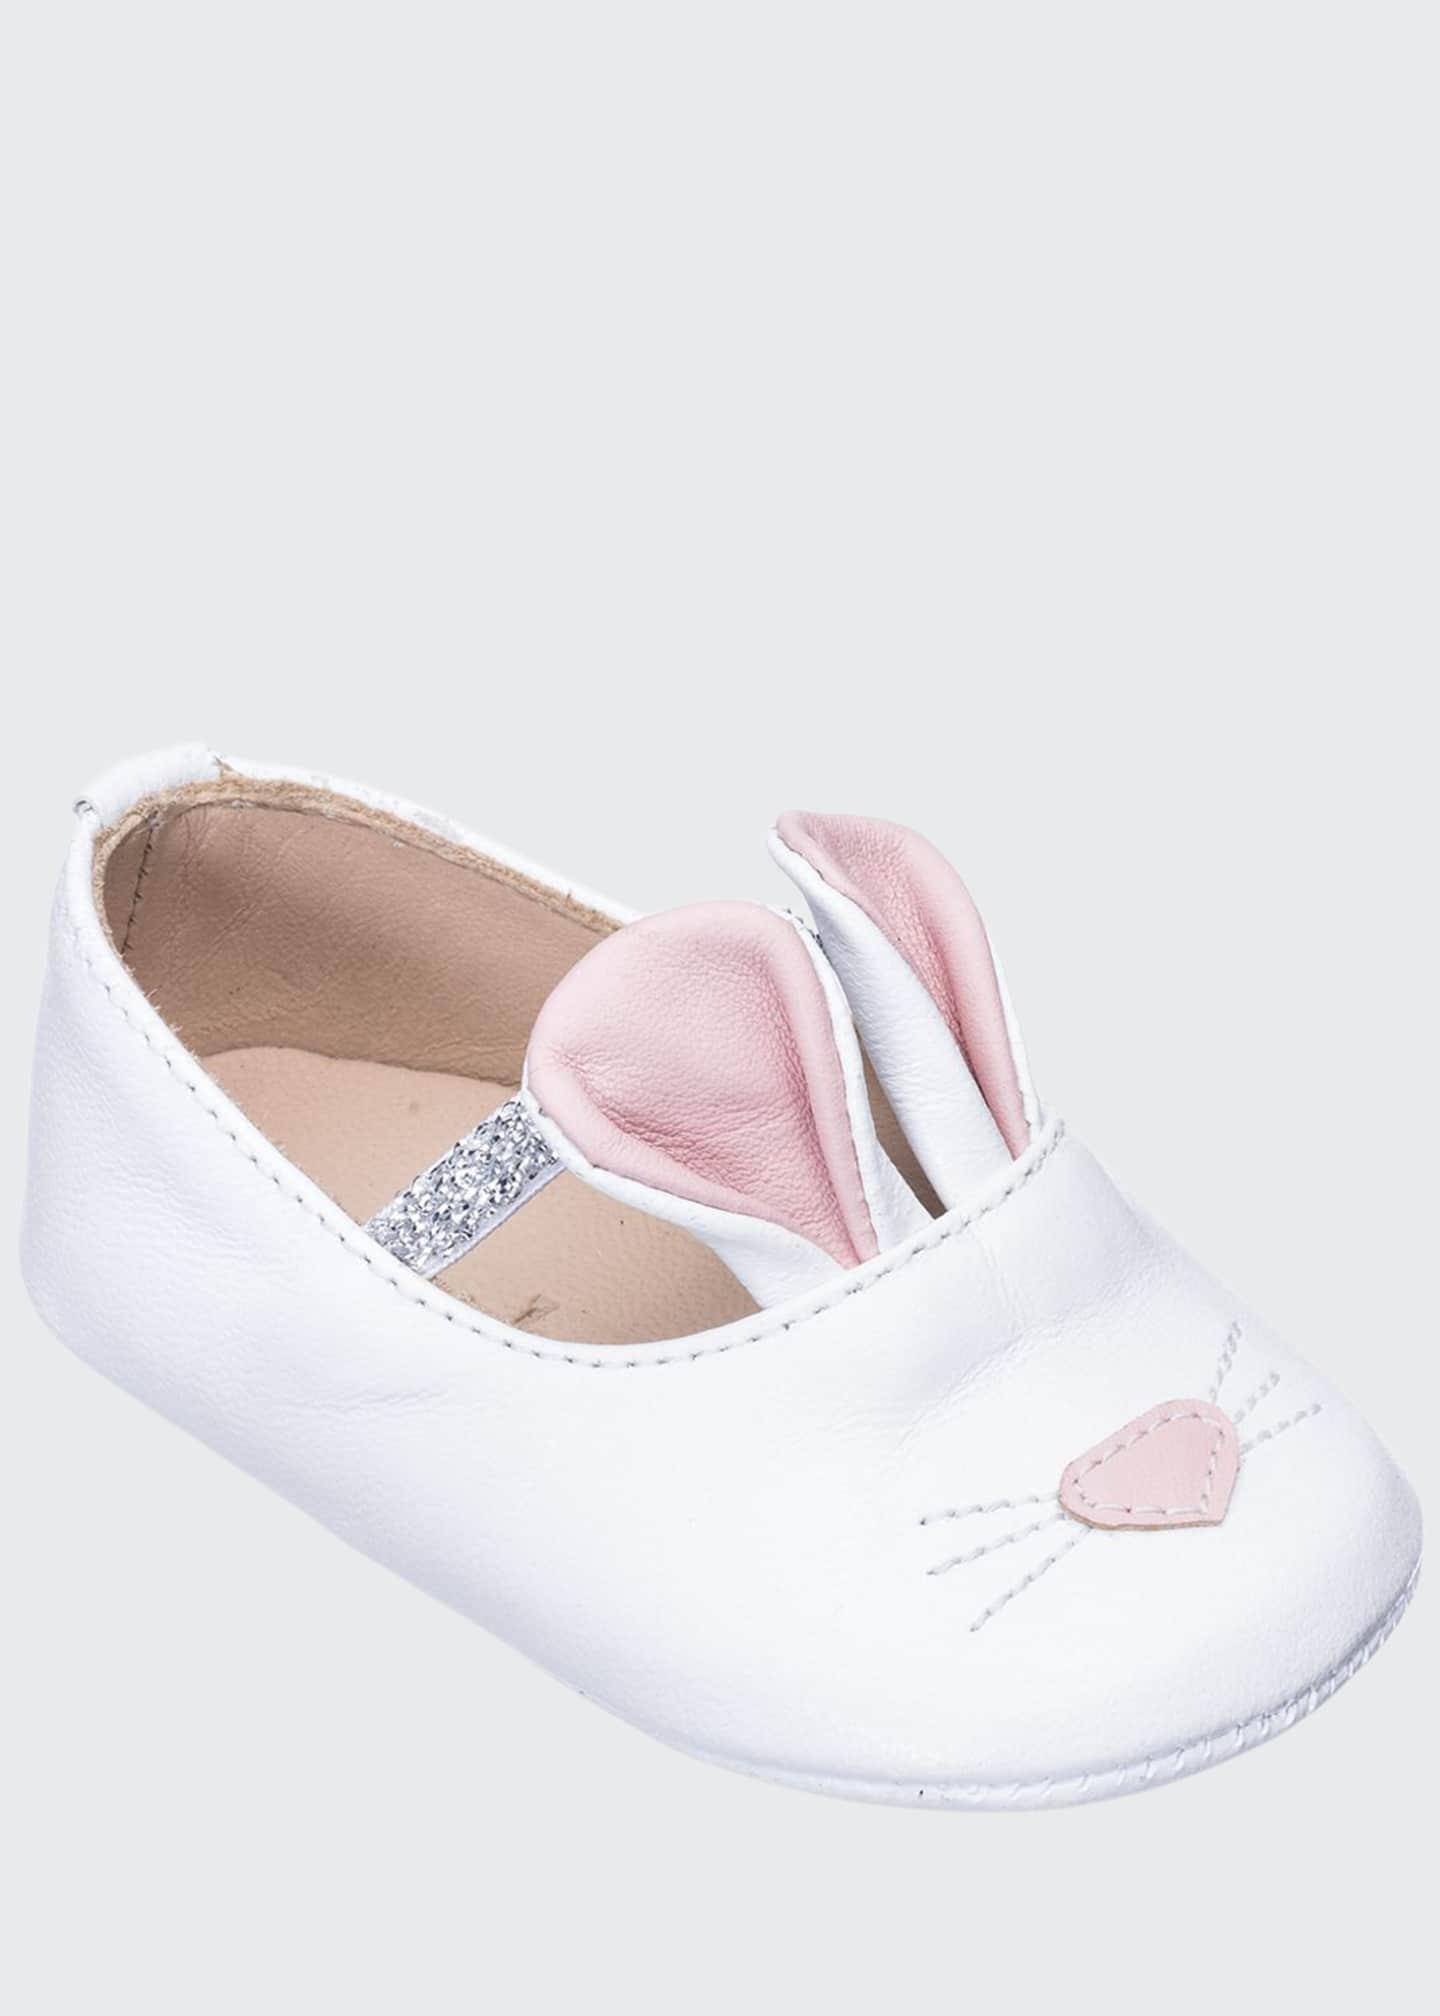 Elephantito Girls' Leather Bunny Sleeper Ballet Flat,